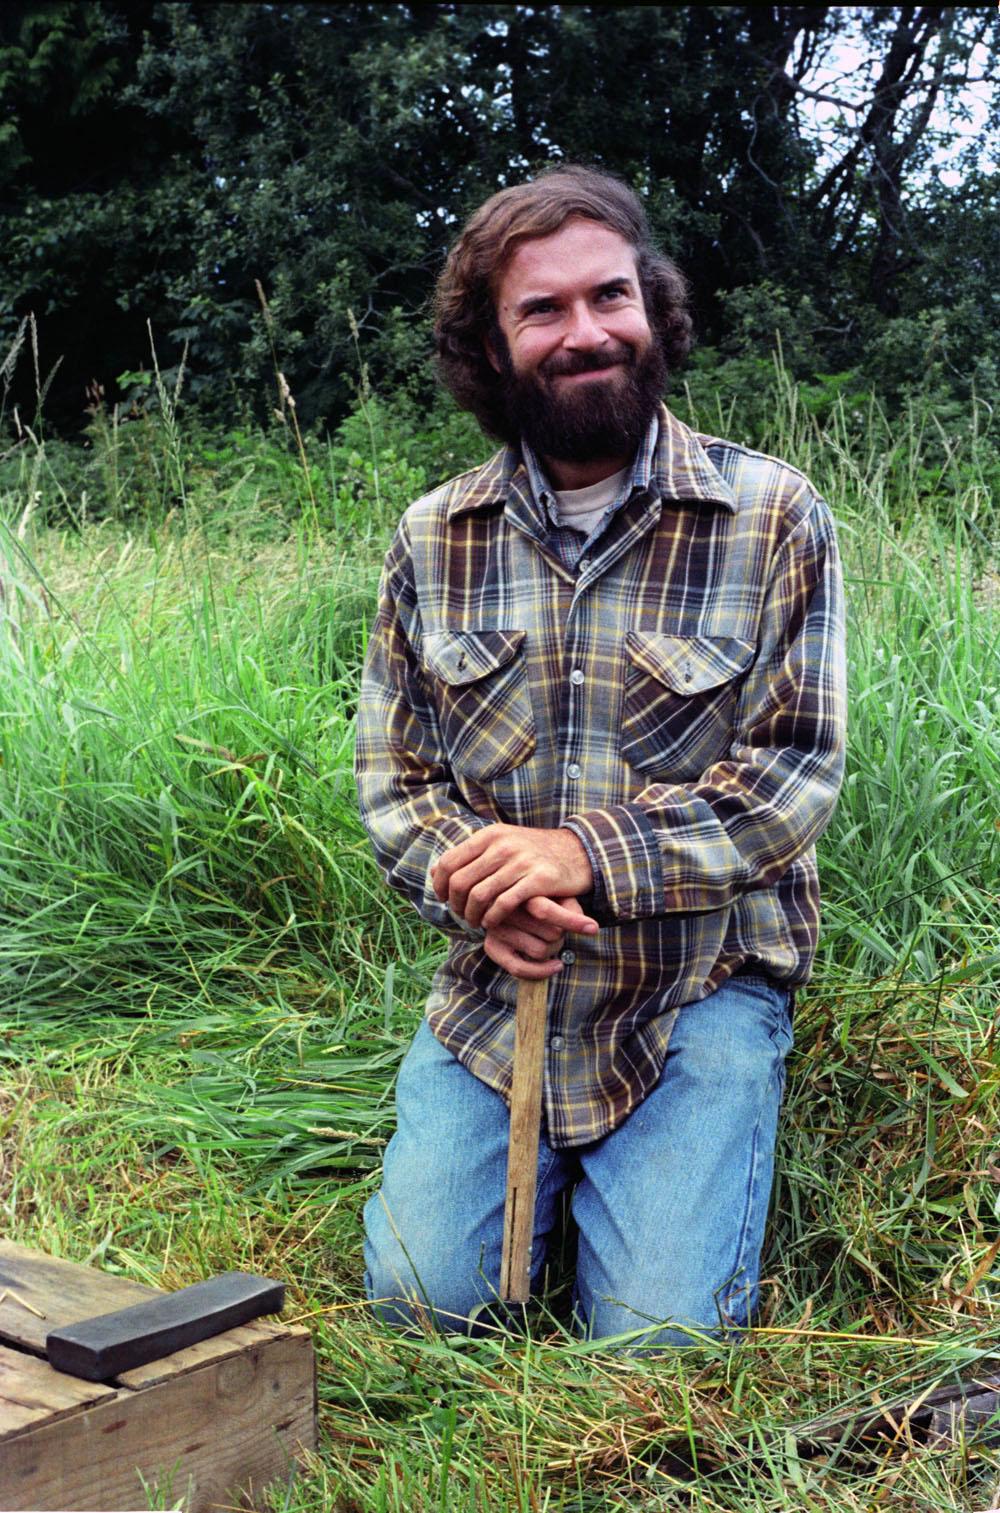 7-20-80 - Larry Korn at Pragtree Farm